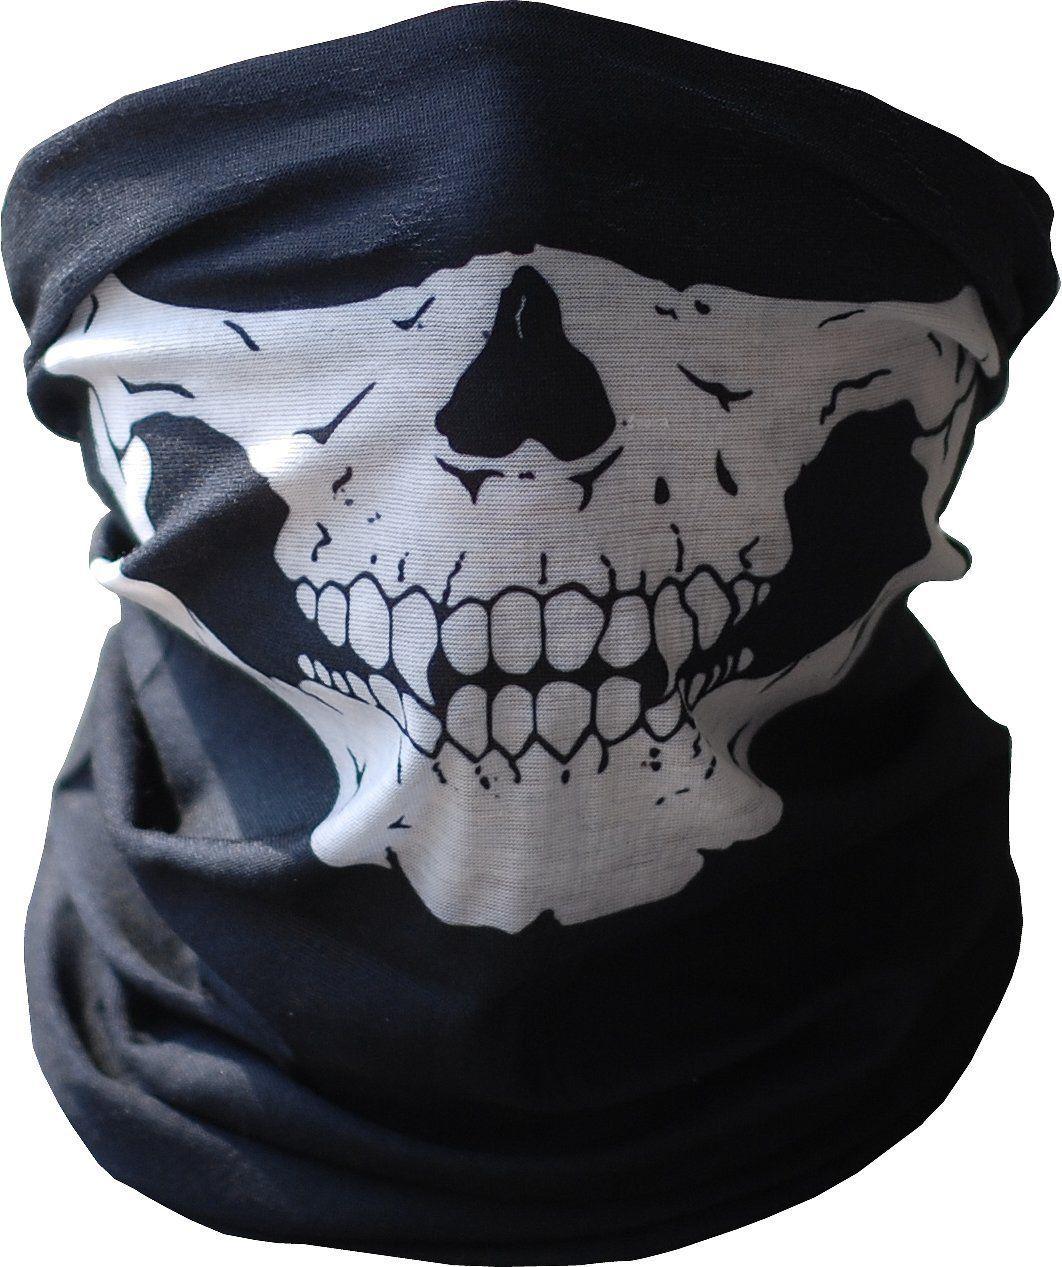 Amazon.com: UrbanSource Black Seamless Skull Face Tube Mask BUFF ...